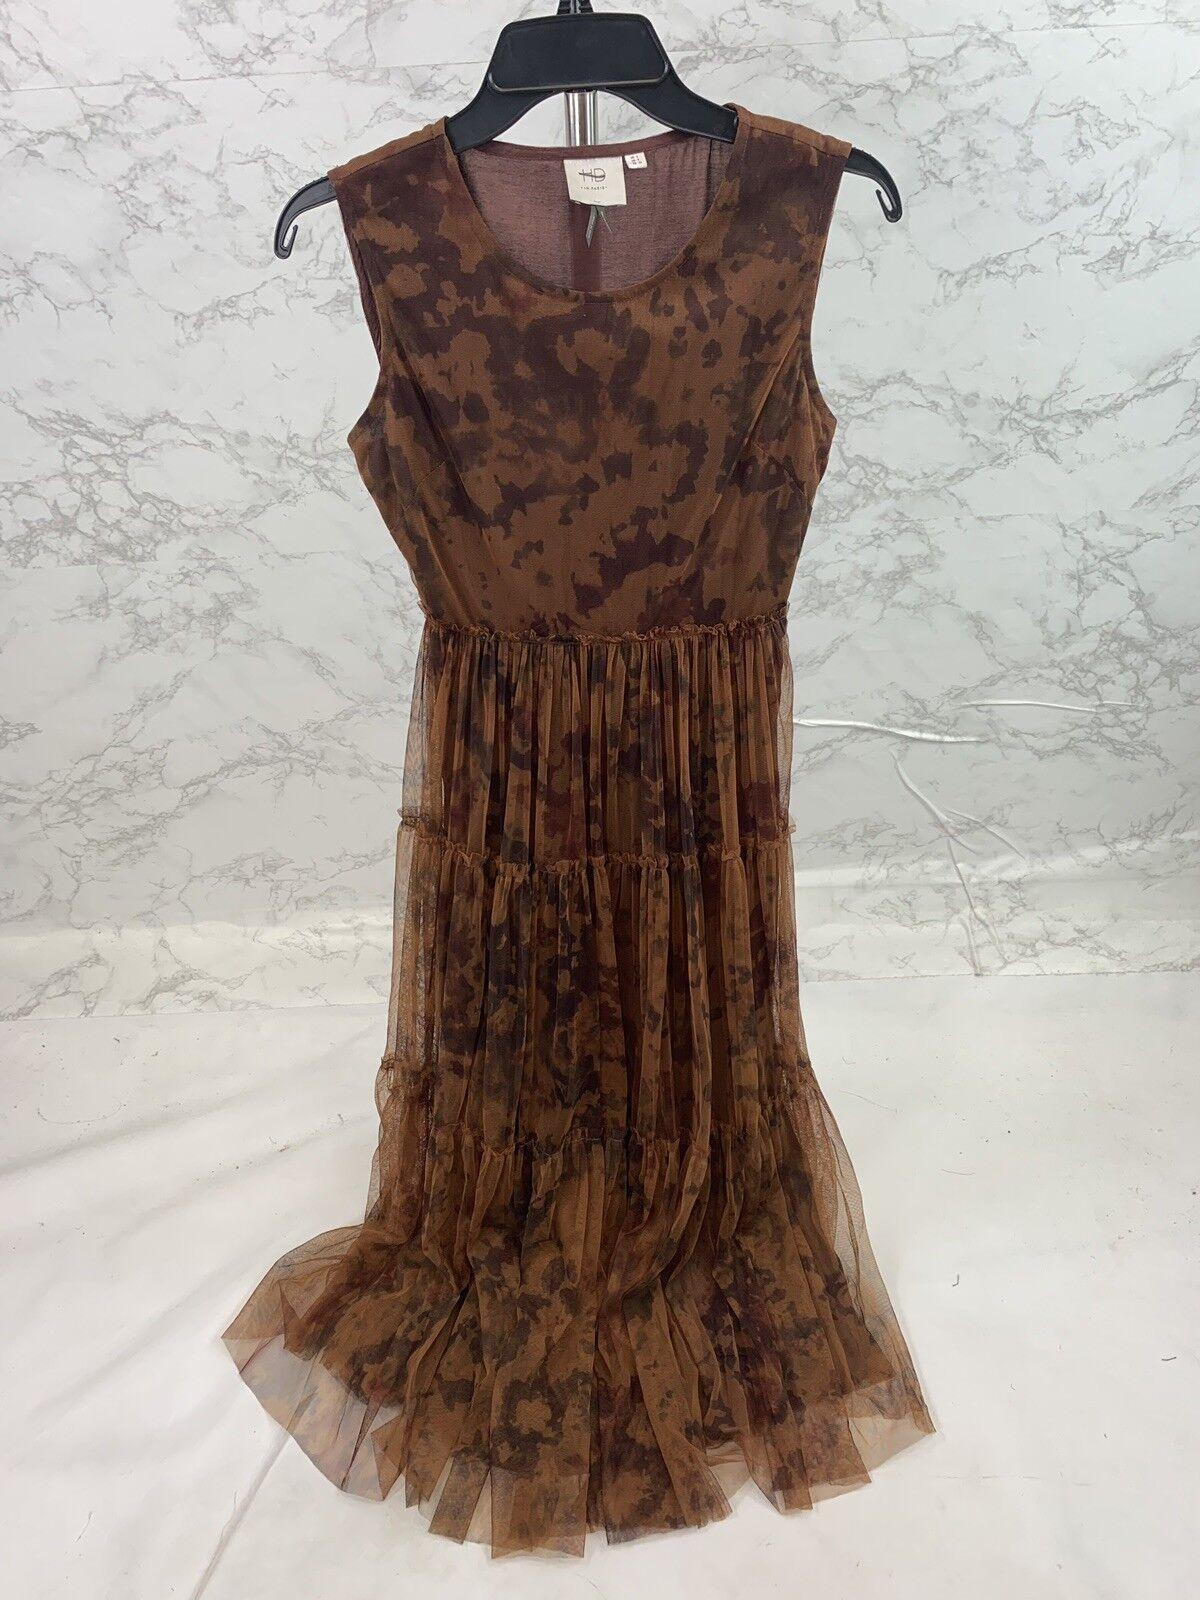 Anthropologie Hd In Paris Paris Paris Women's Brown Mesh Dress Size 2 ebd138